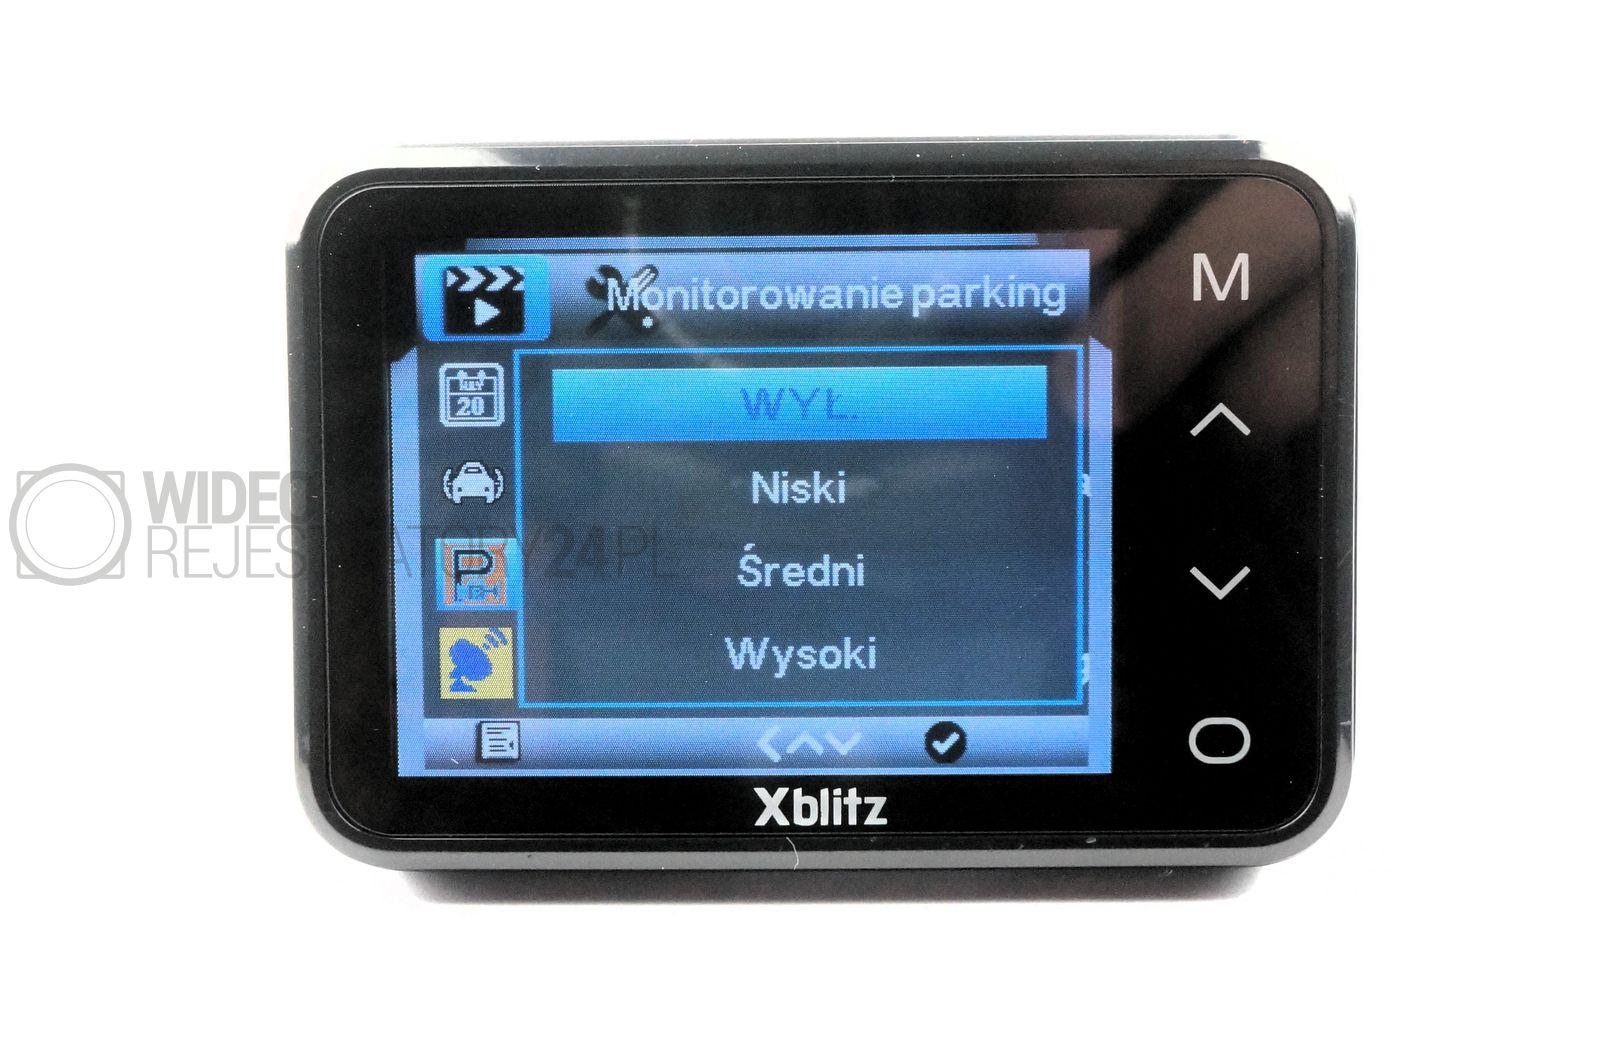 Xblitz Night mode parking